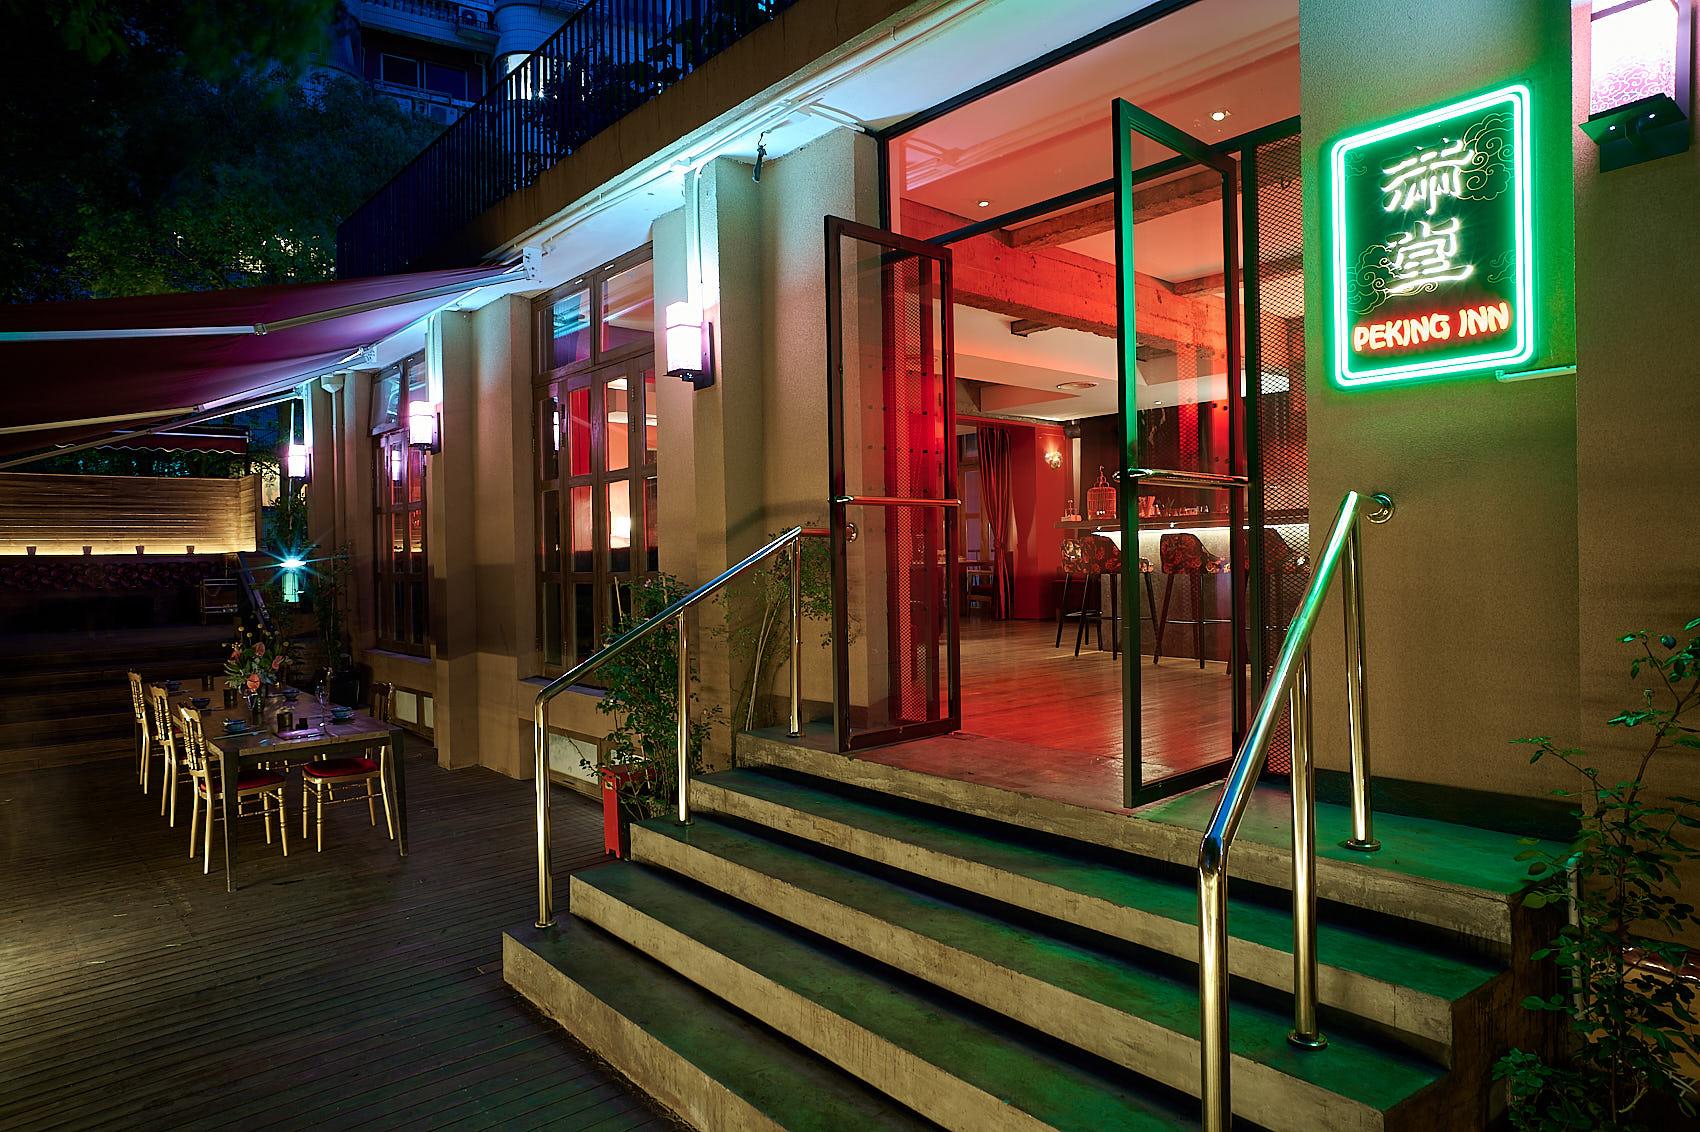 Peking Inn Shanghai